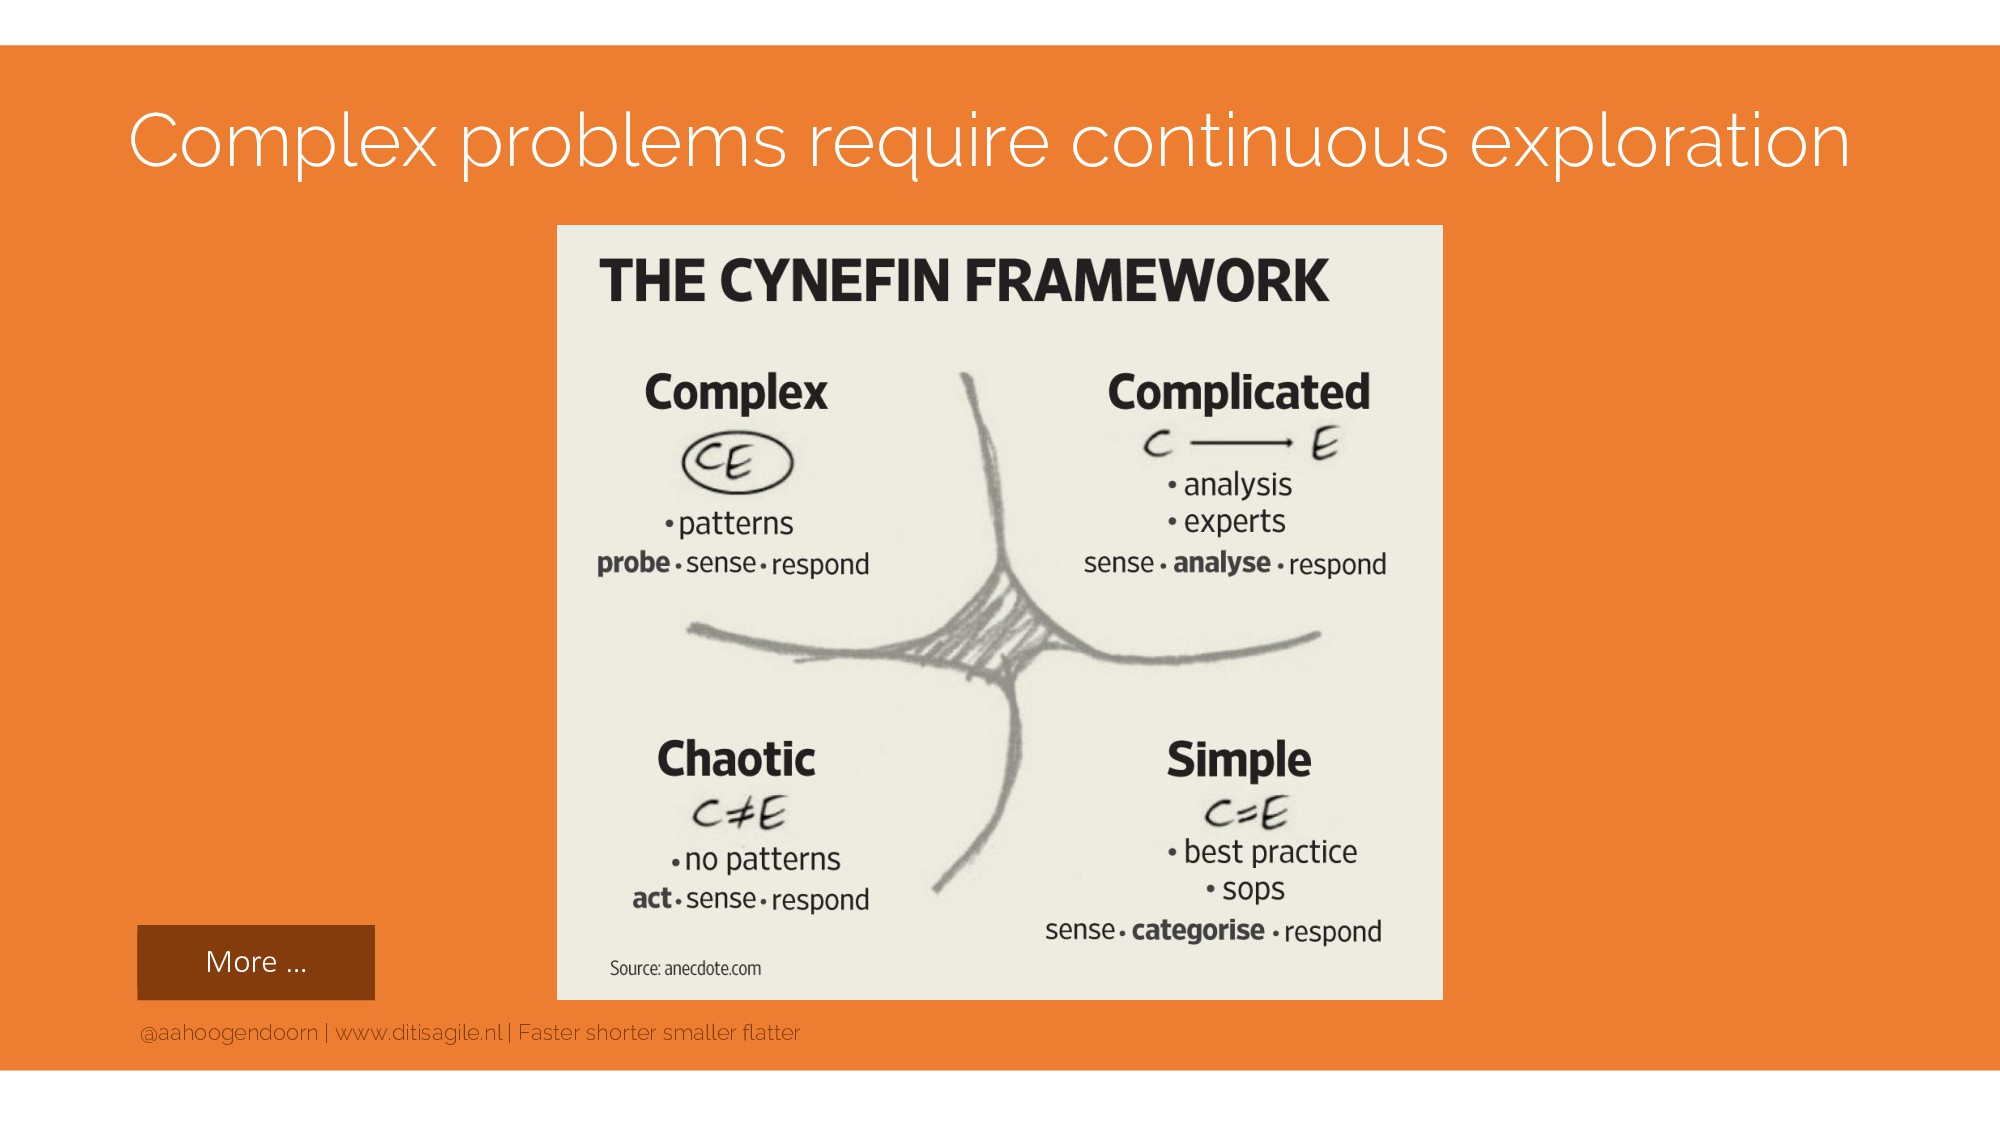 More … Complex problems require continuous expl...